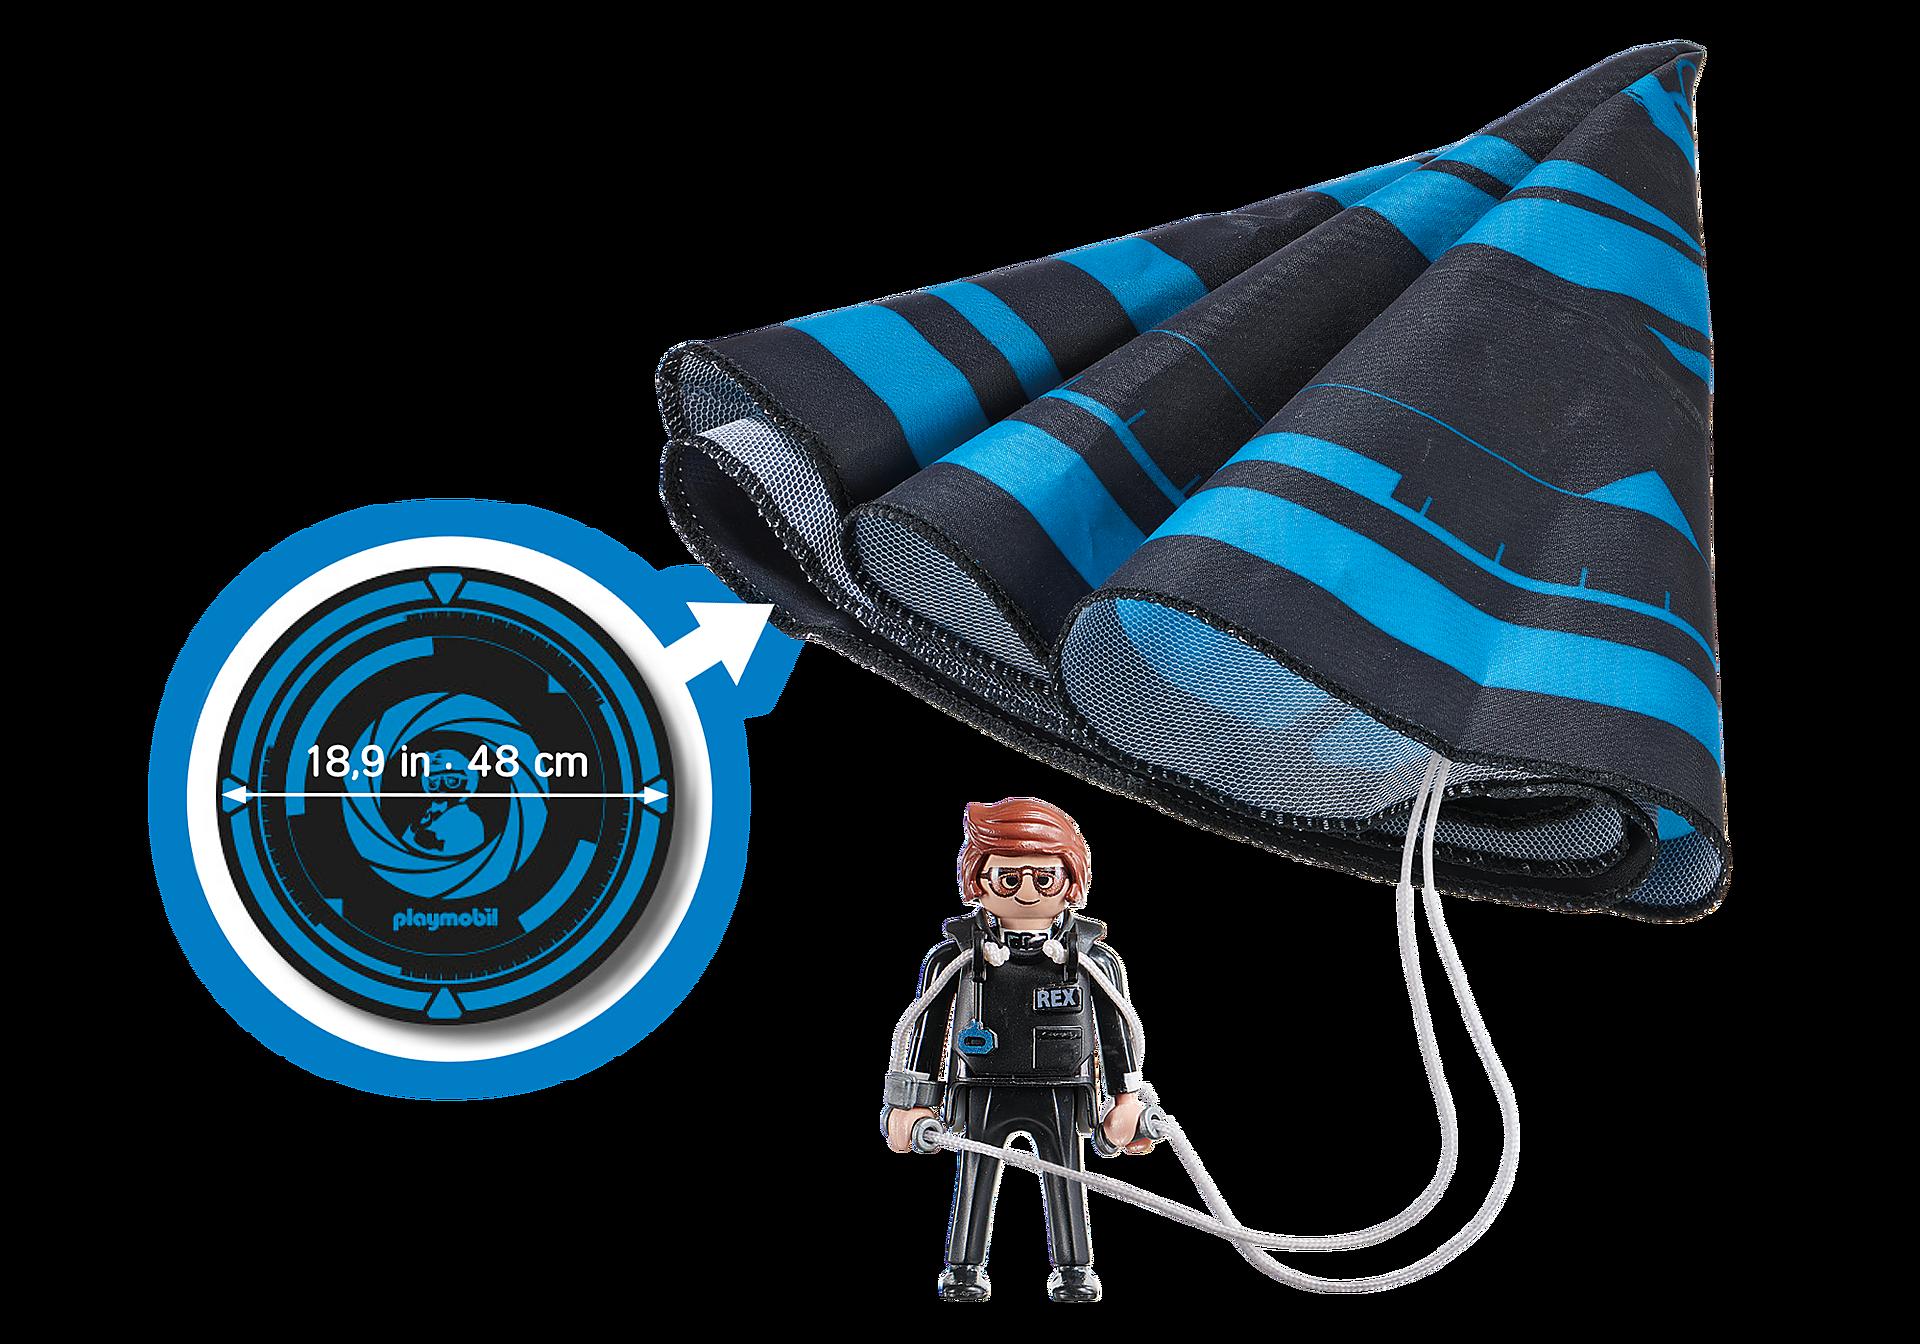 70070 PLAYMOBIL: THE MOVIE Rex Dasher avec parachute zoom image3